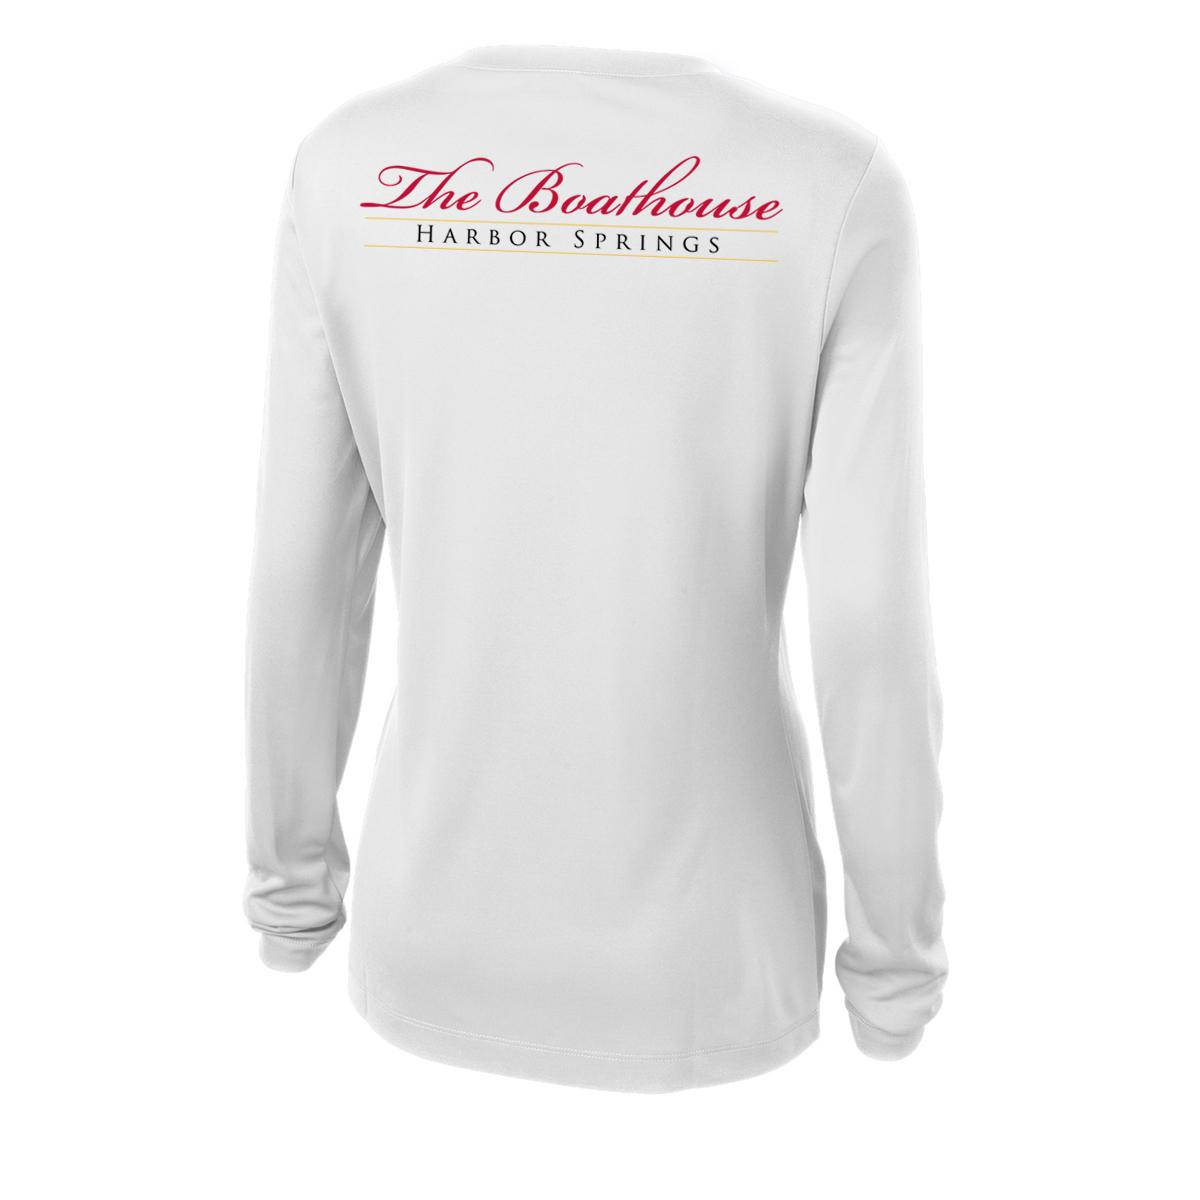 Boathouse of Harbor Springs - Women's Long Sleeve Tech Tee (BHS214)